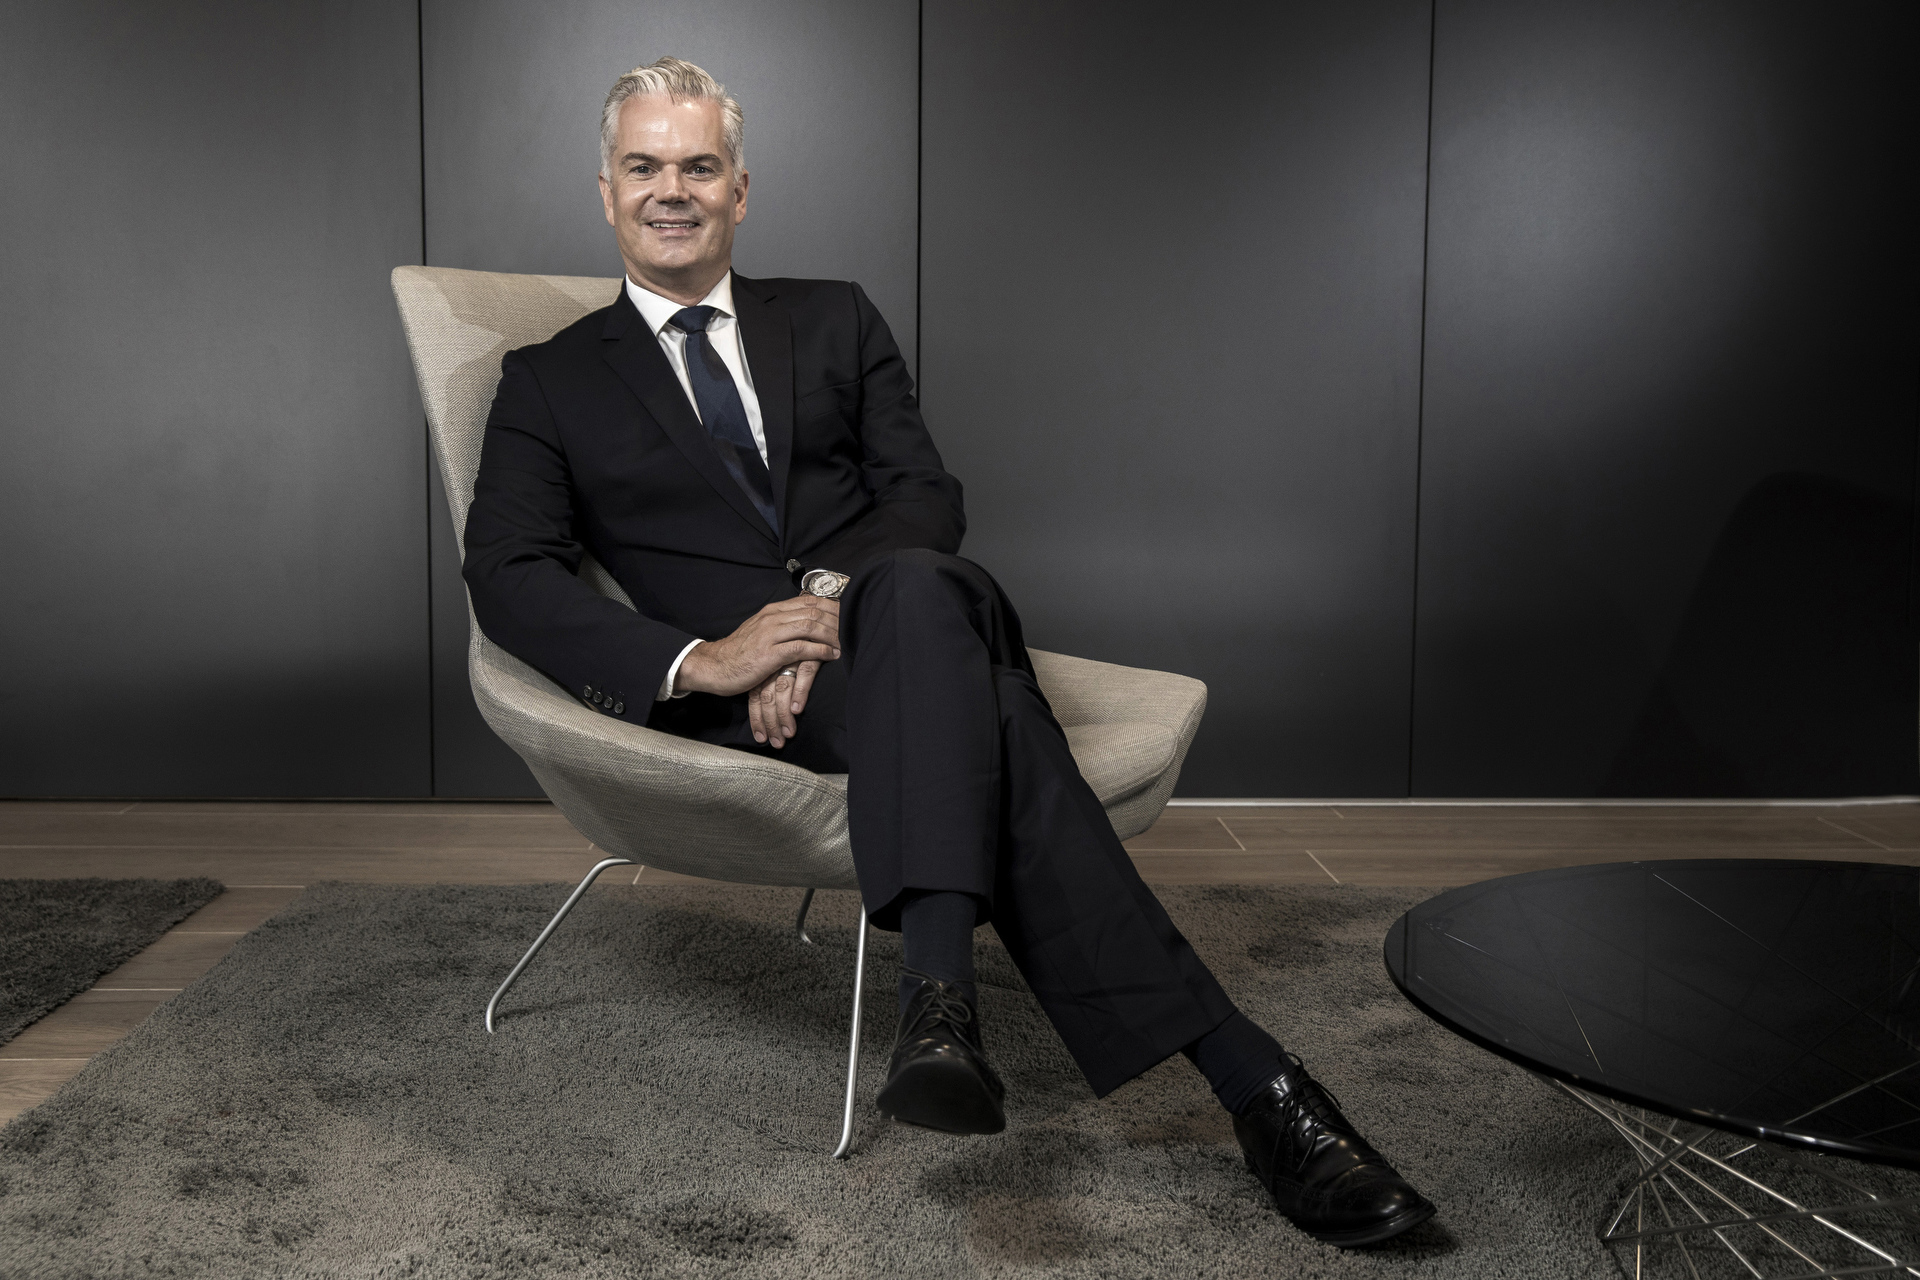 Sydney portrait photographer, personal branding, head shots, corporate photography, Cars, Audi Australia, CEO